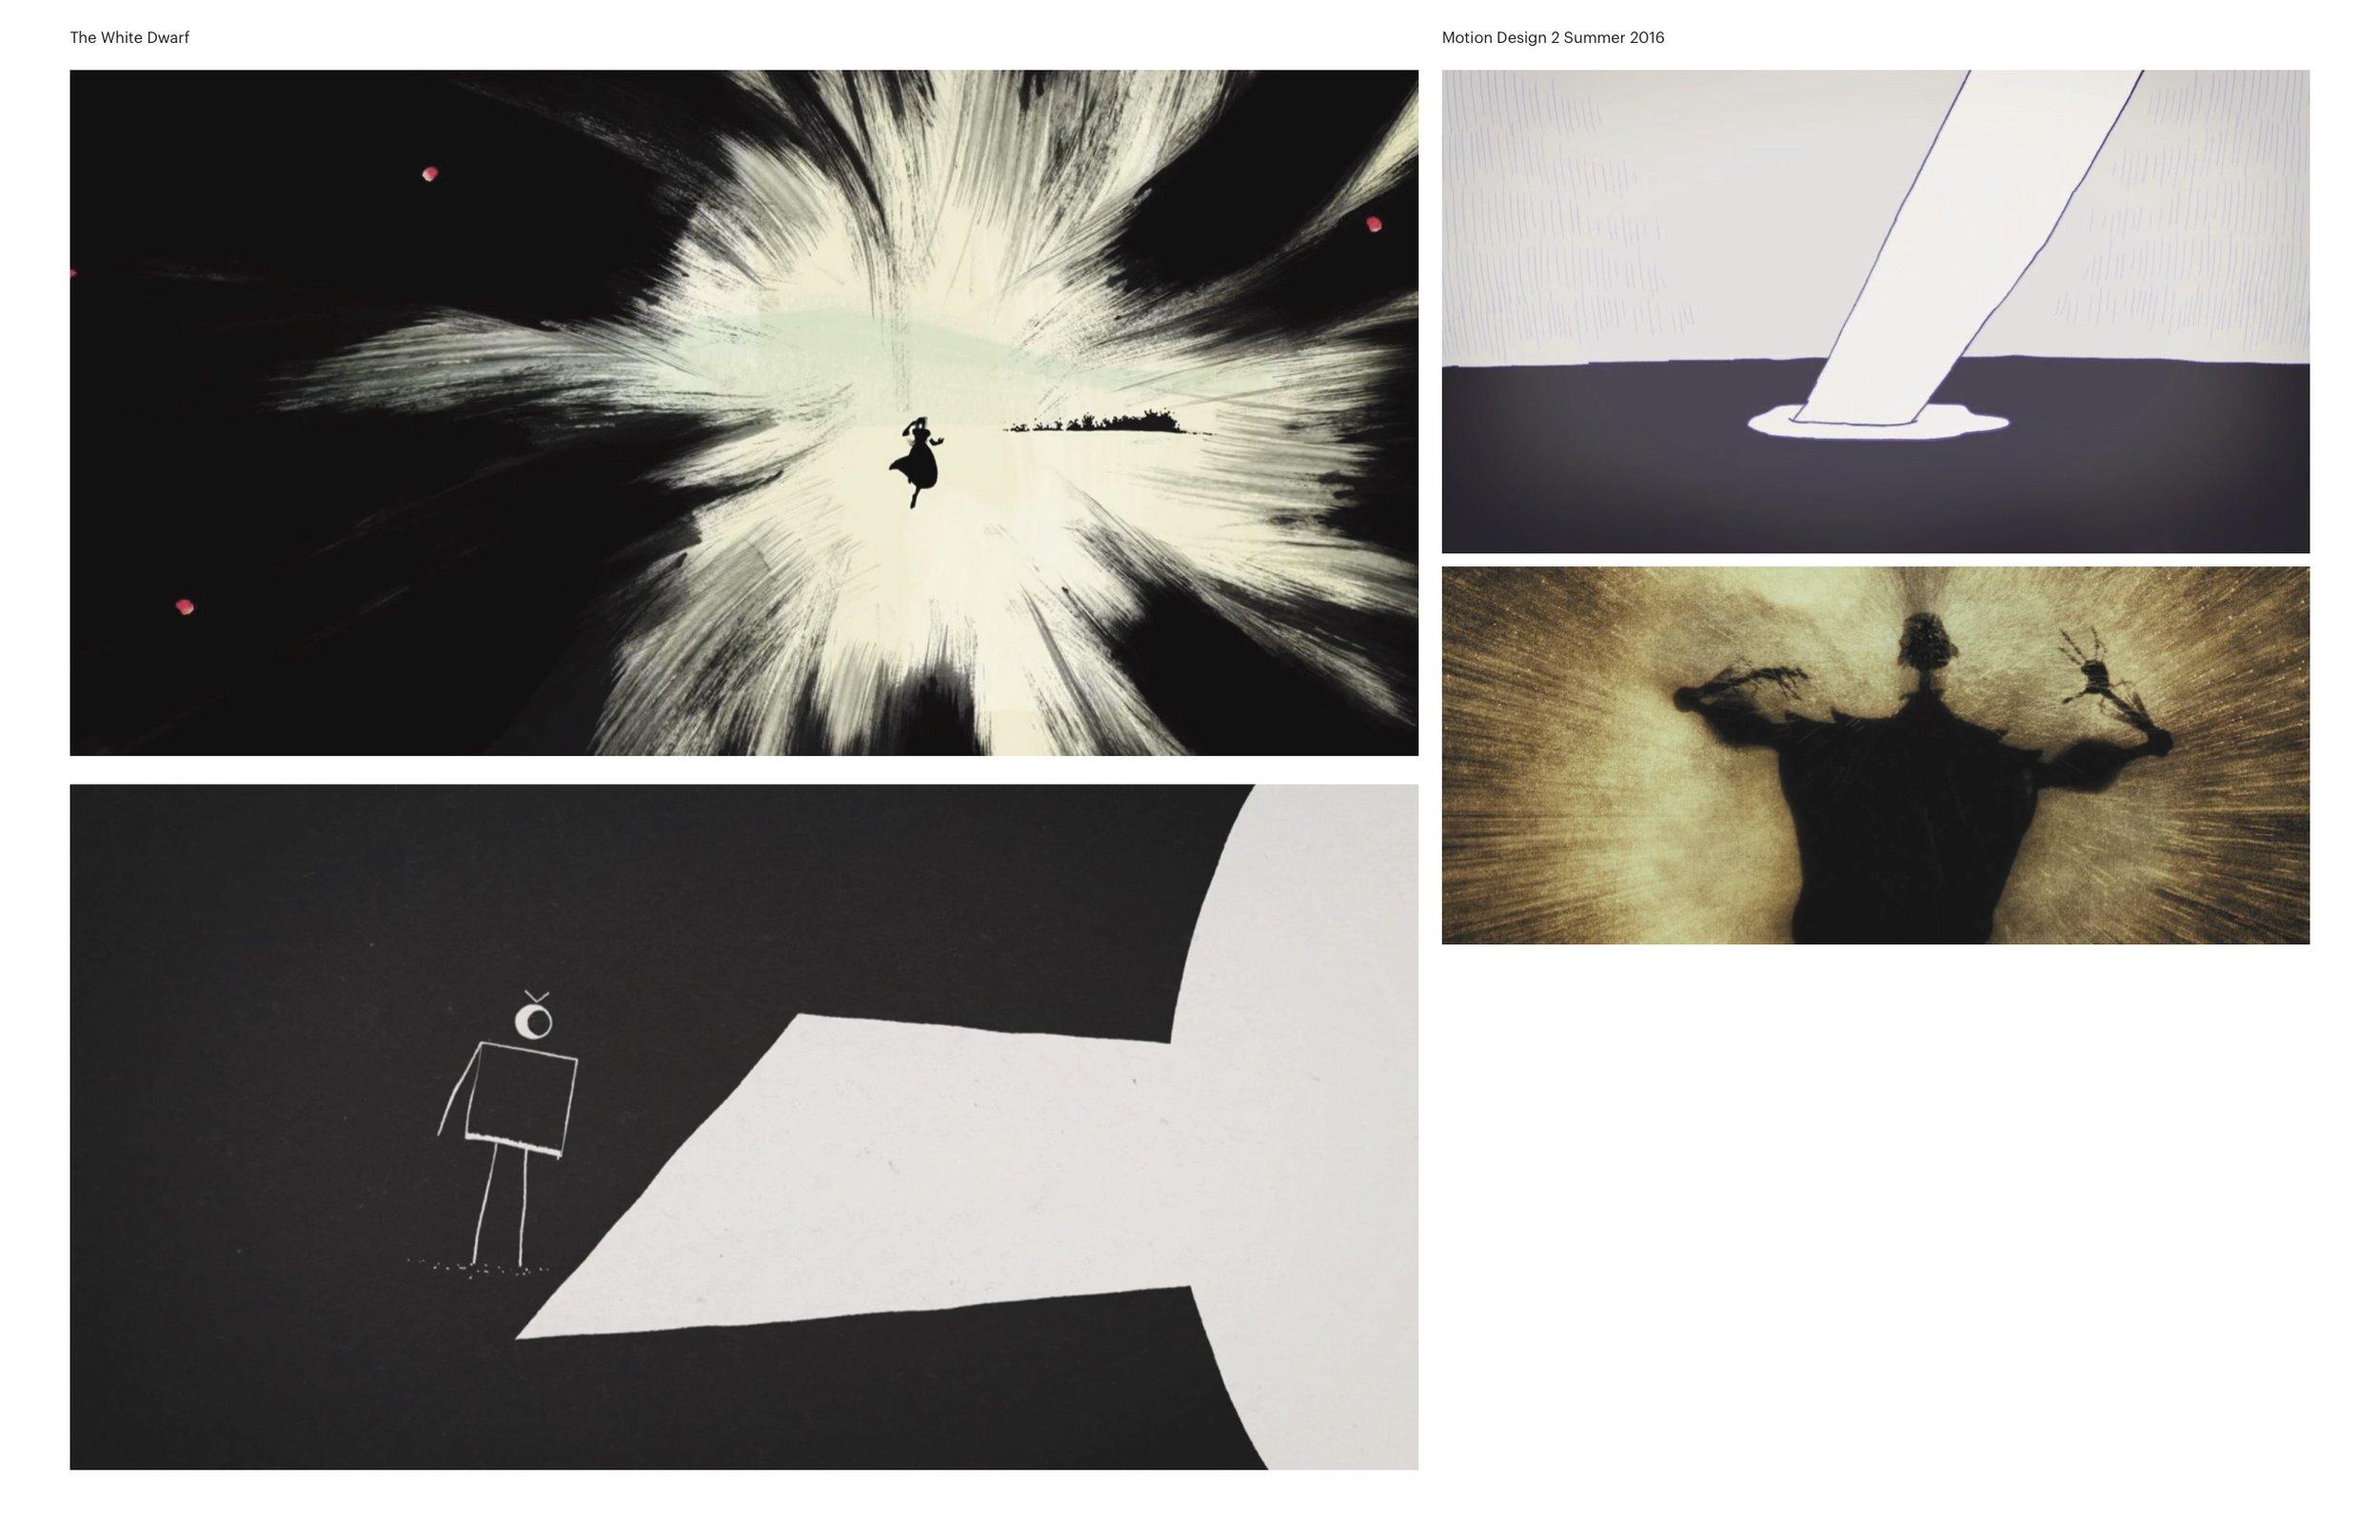 The_White_Dwarf_Presentation6.jpg